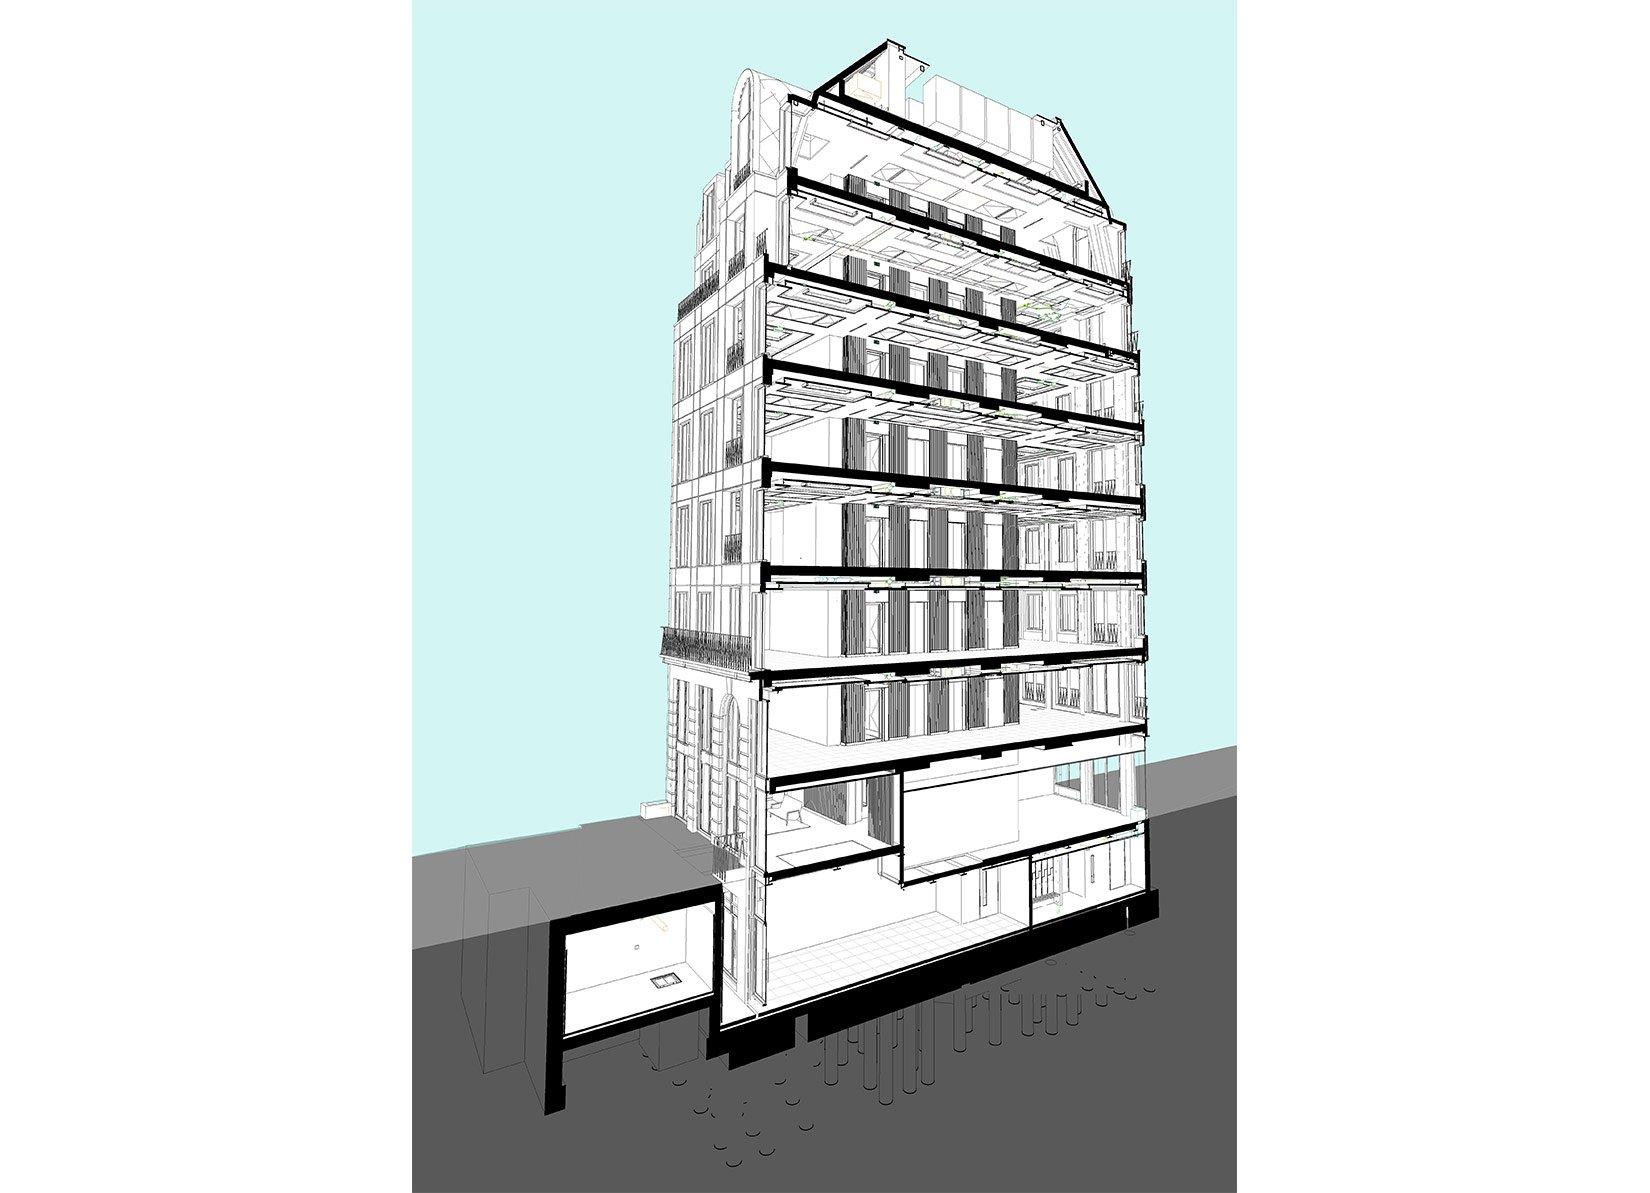 26 St James's Square, London, 3D Section